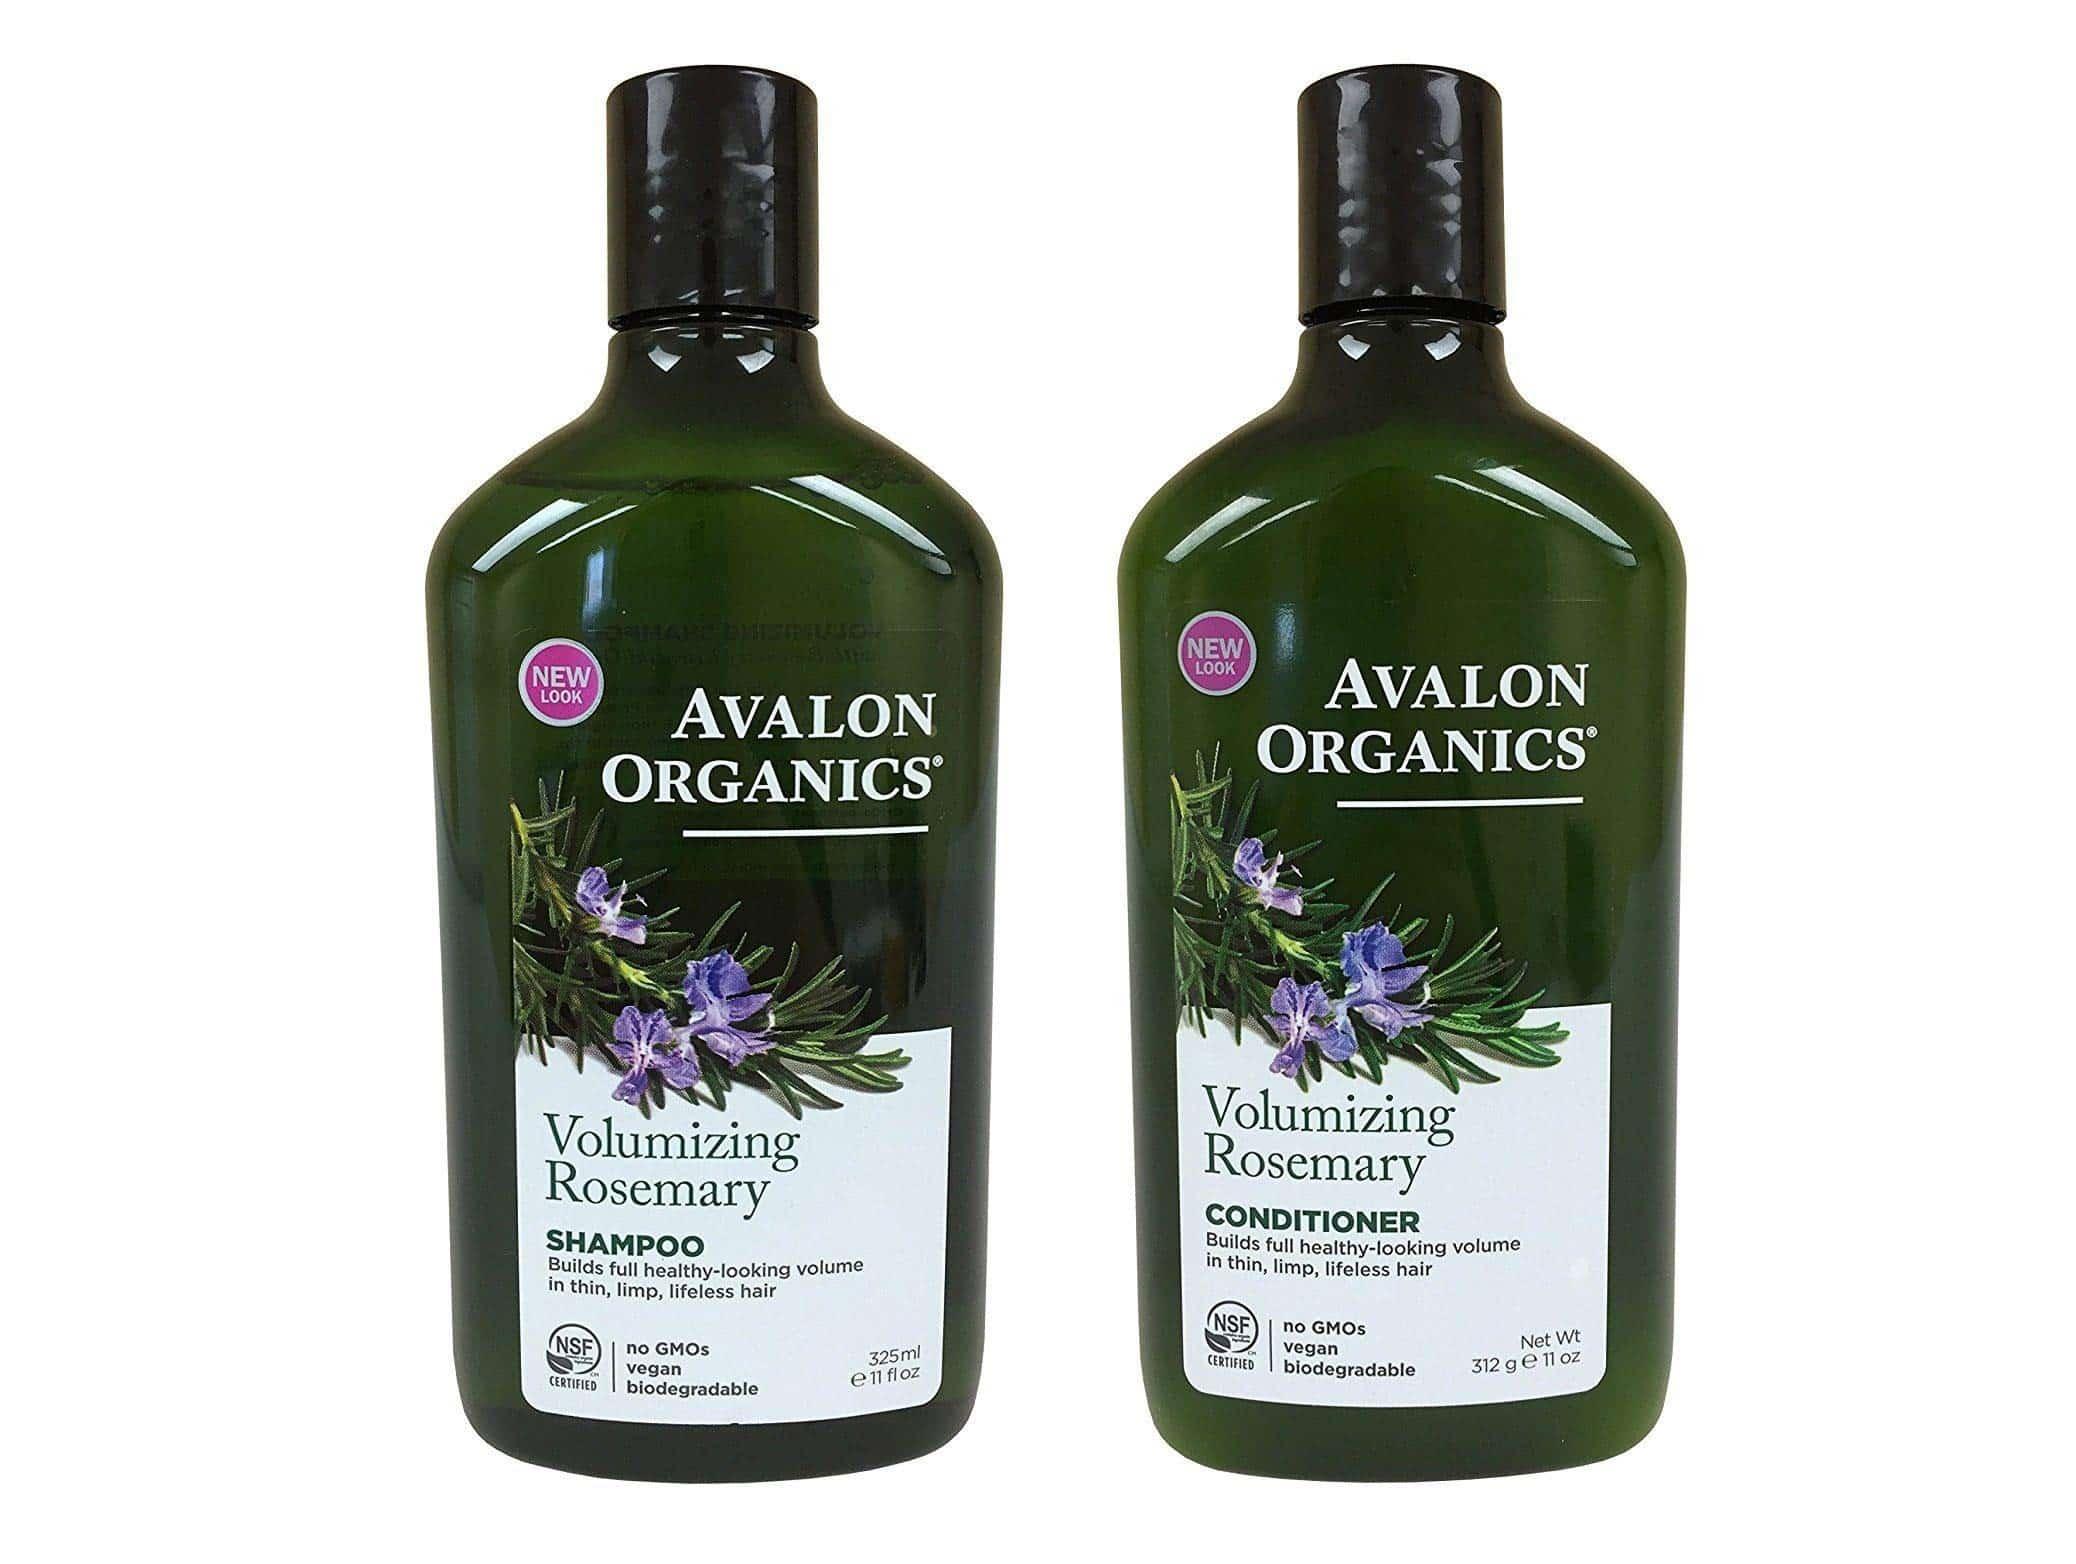 Avalon-Organics-Volumizing-Rosemary-Conditioner